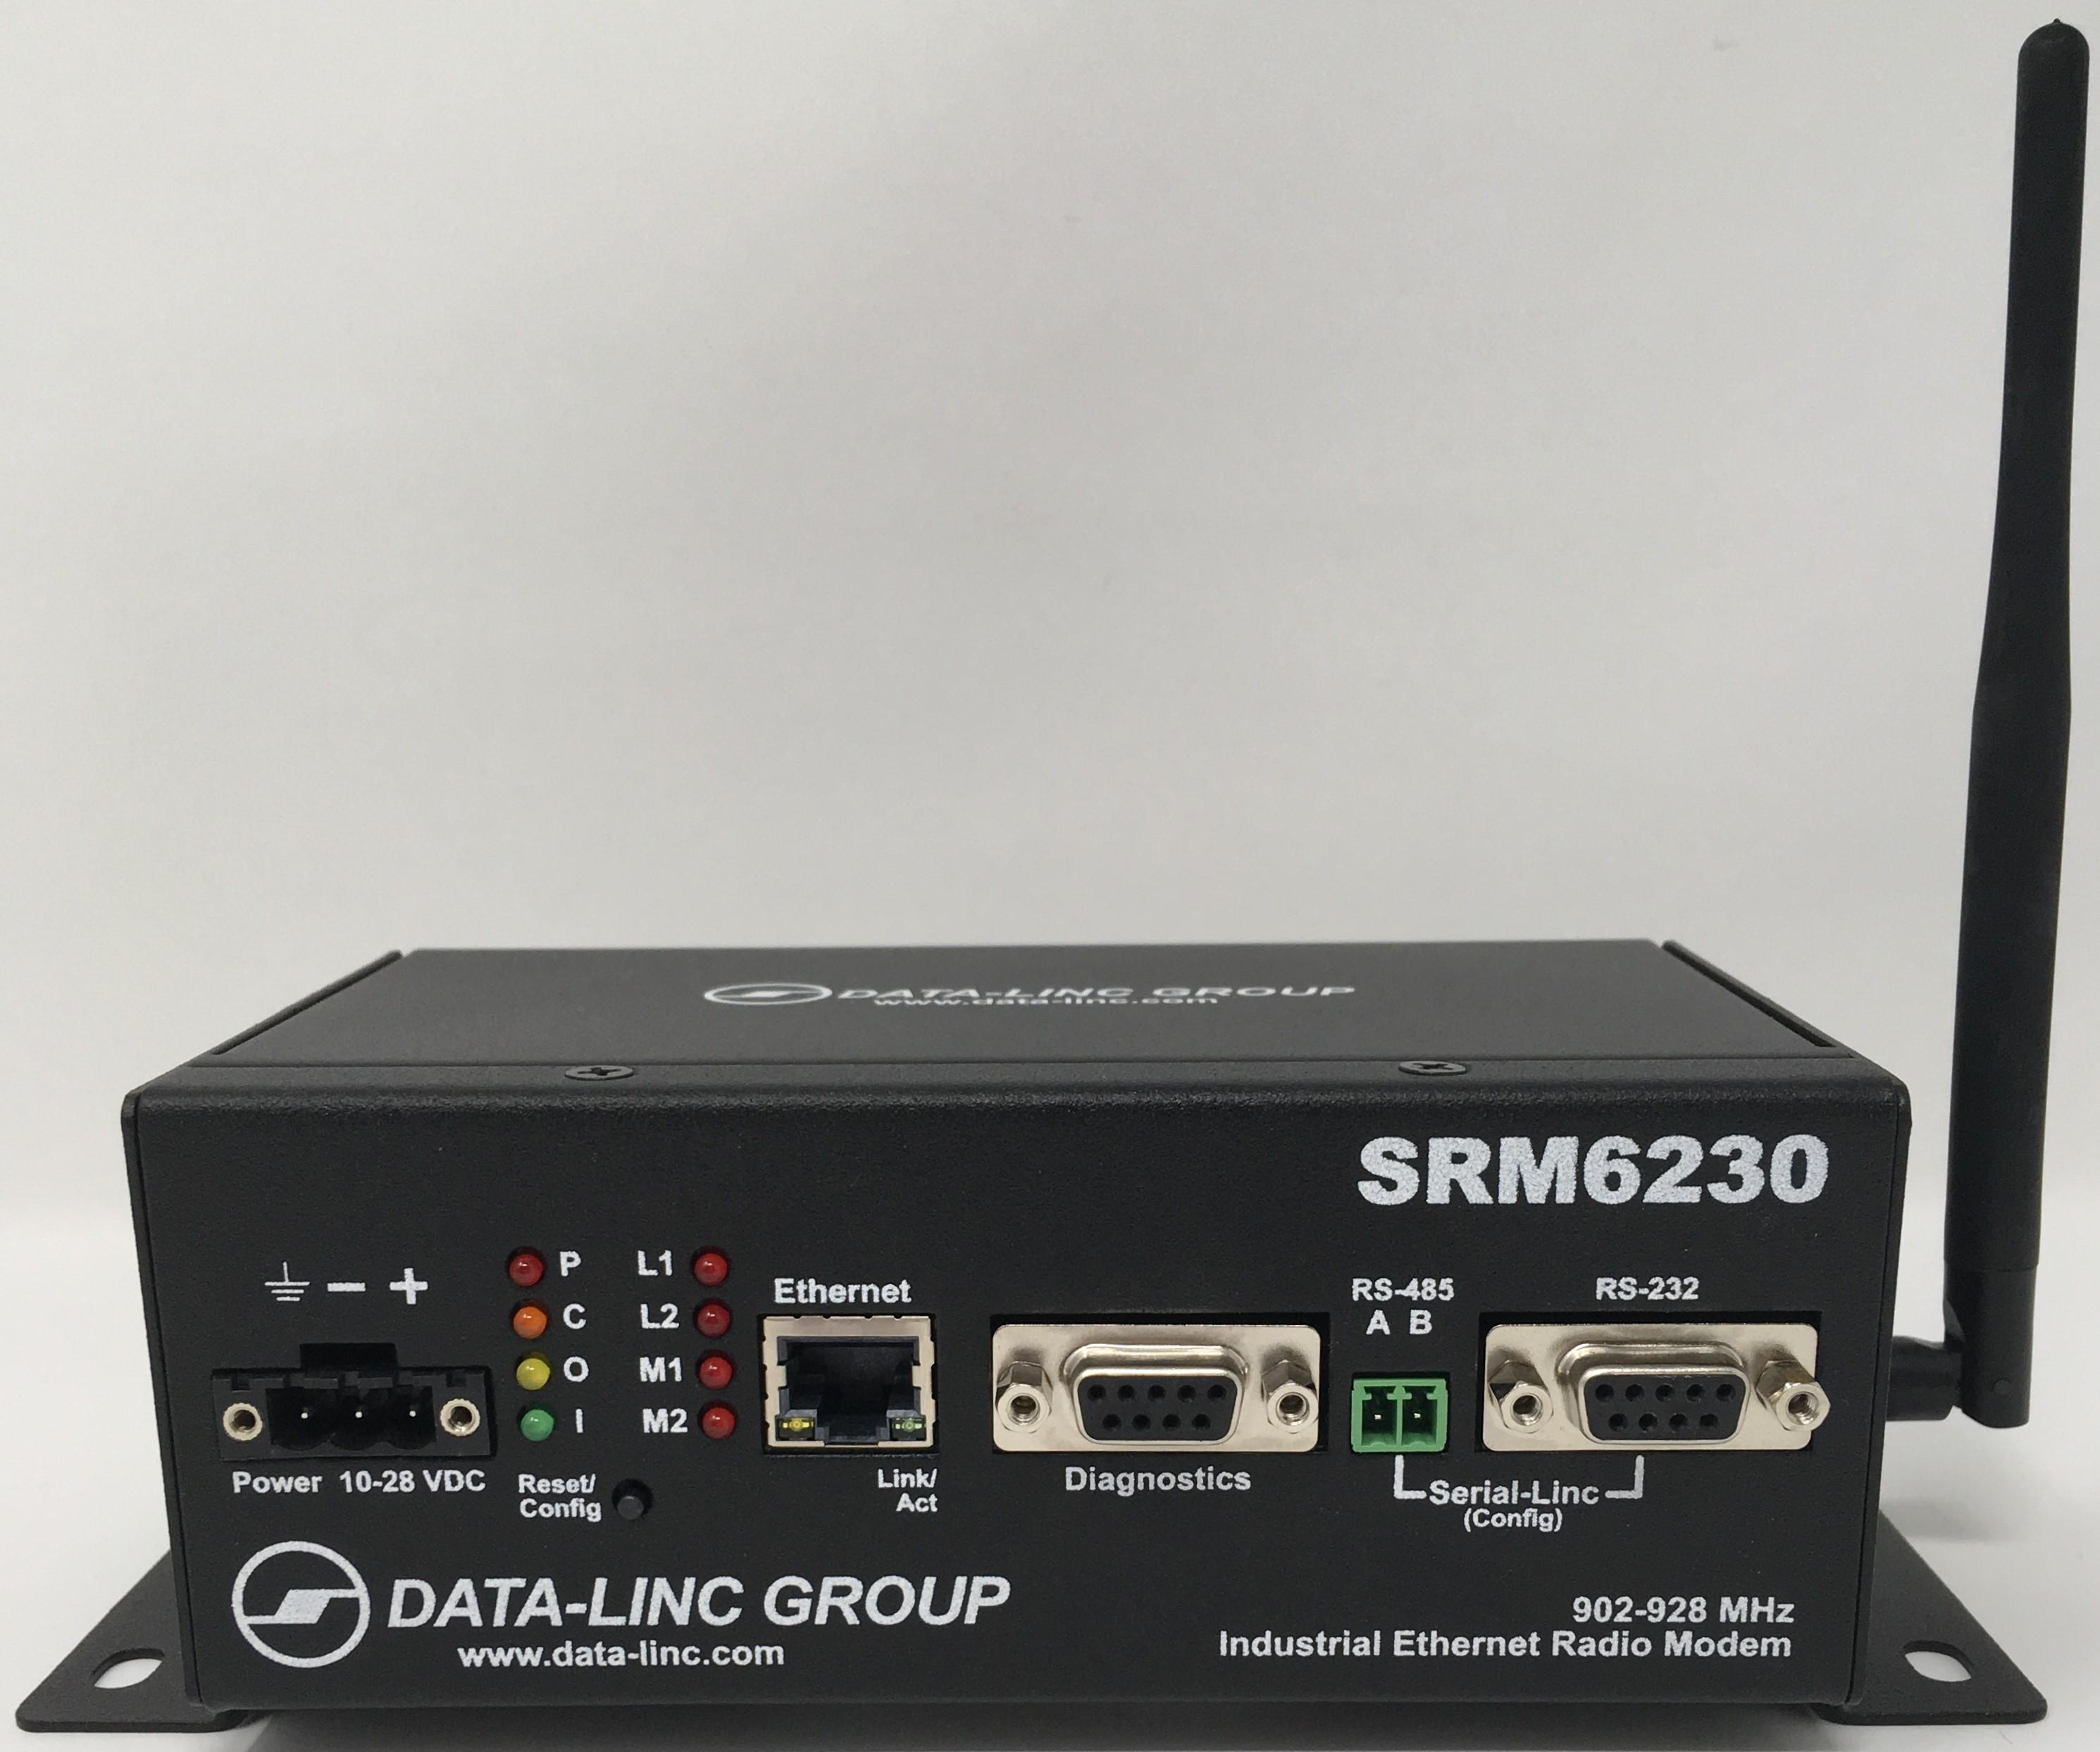 Srm6230 Data Linc Group Cat5 Wiring Diagram Faceplate Long Range Fhss 900 Mhz Ethernet Radio Modem